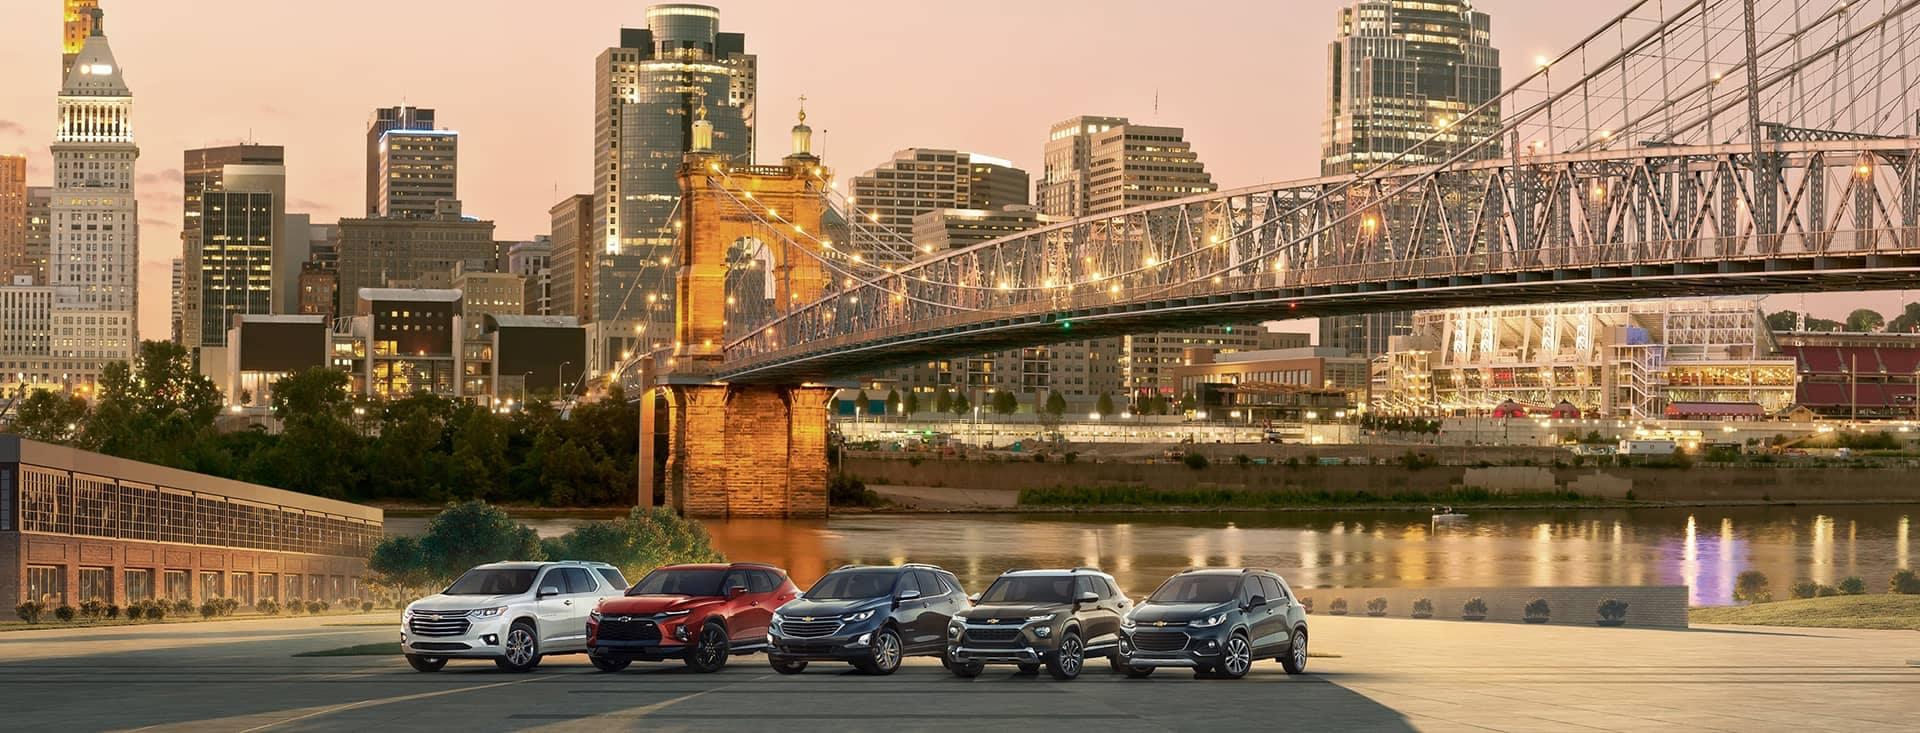 Mccluskey Chevrolet Cincinnati Oh New And Used Auto Dealership